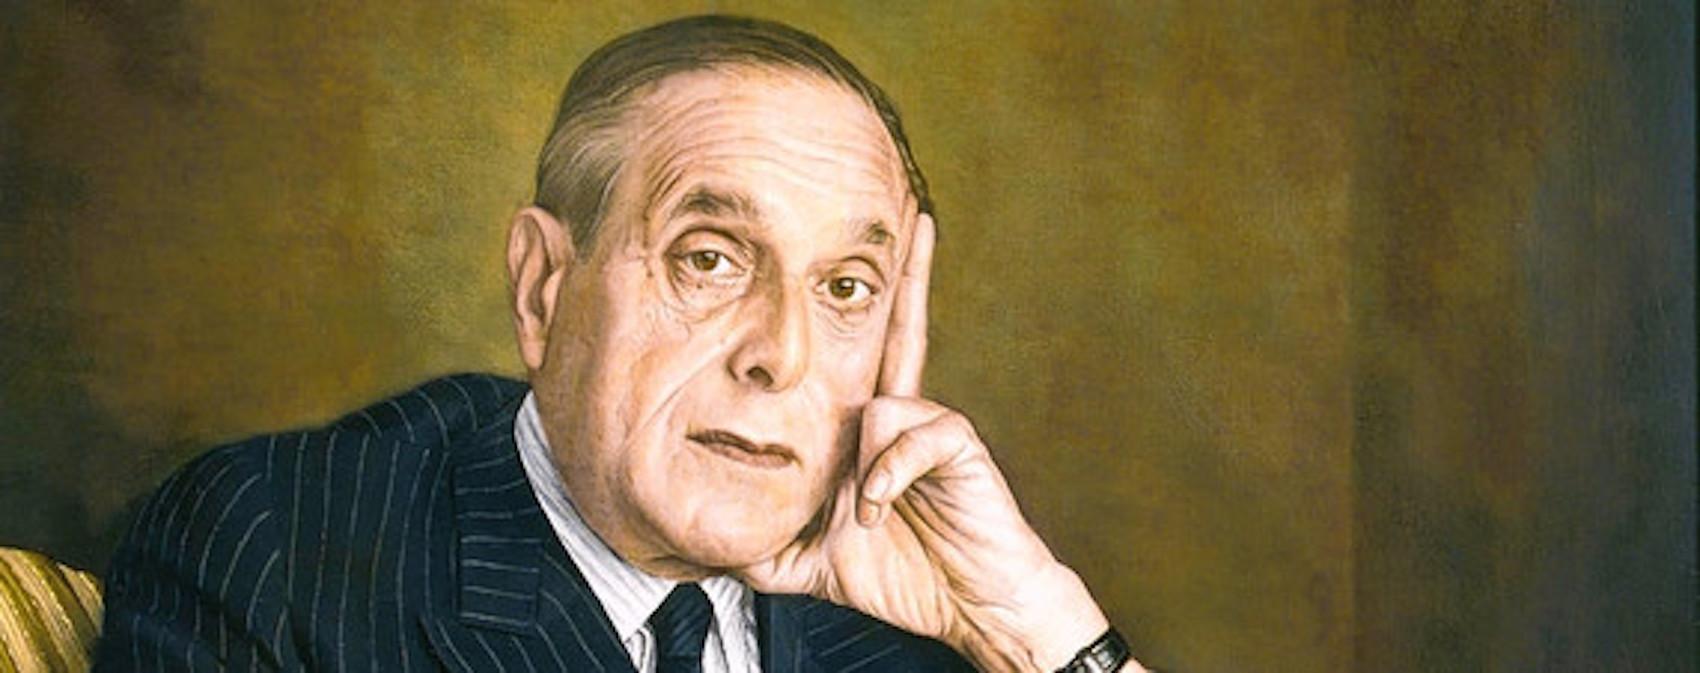 Siegmund Warburg, le banquier qui inventa les eurobonds